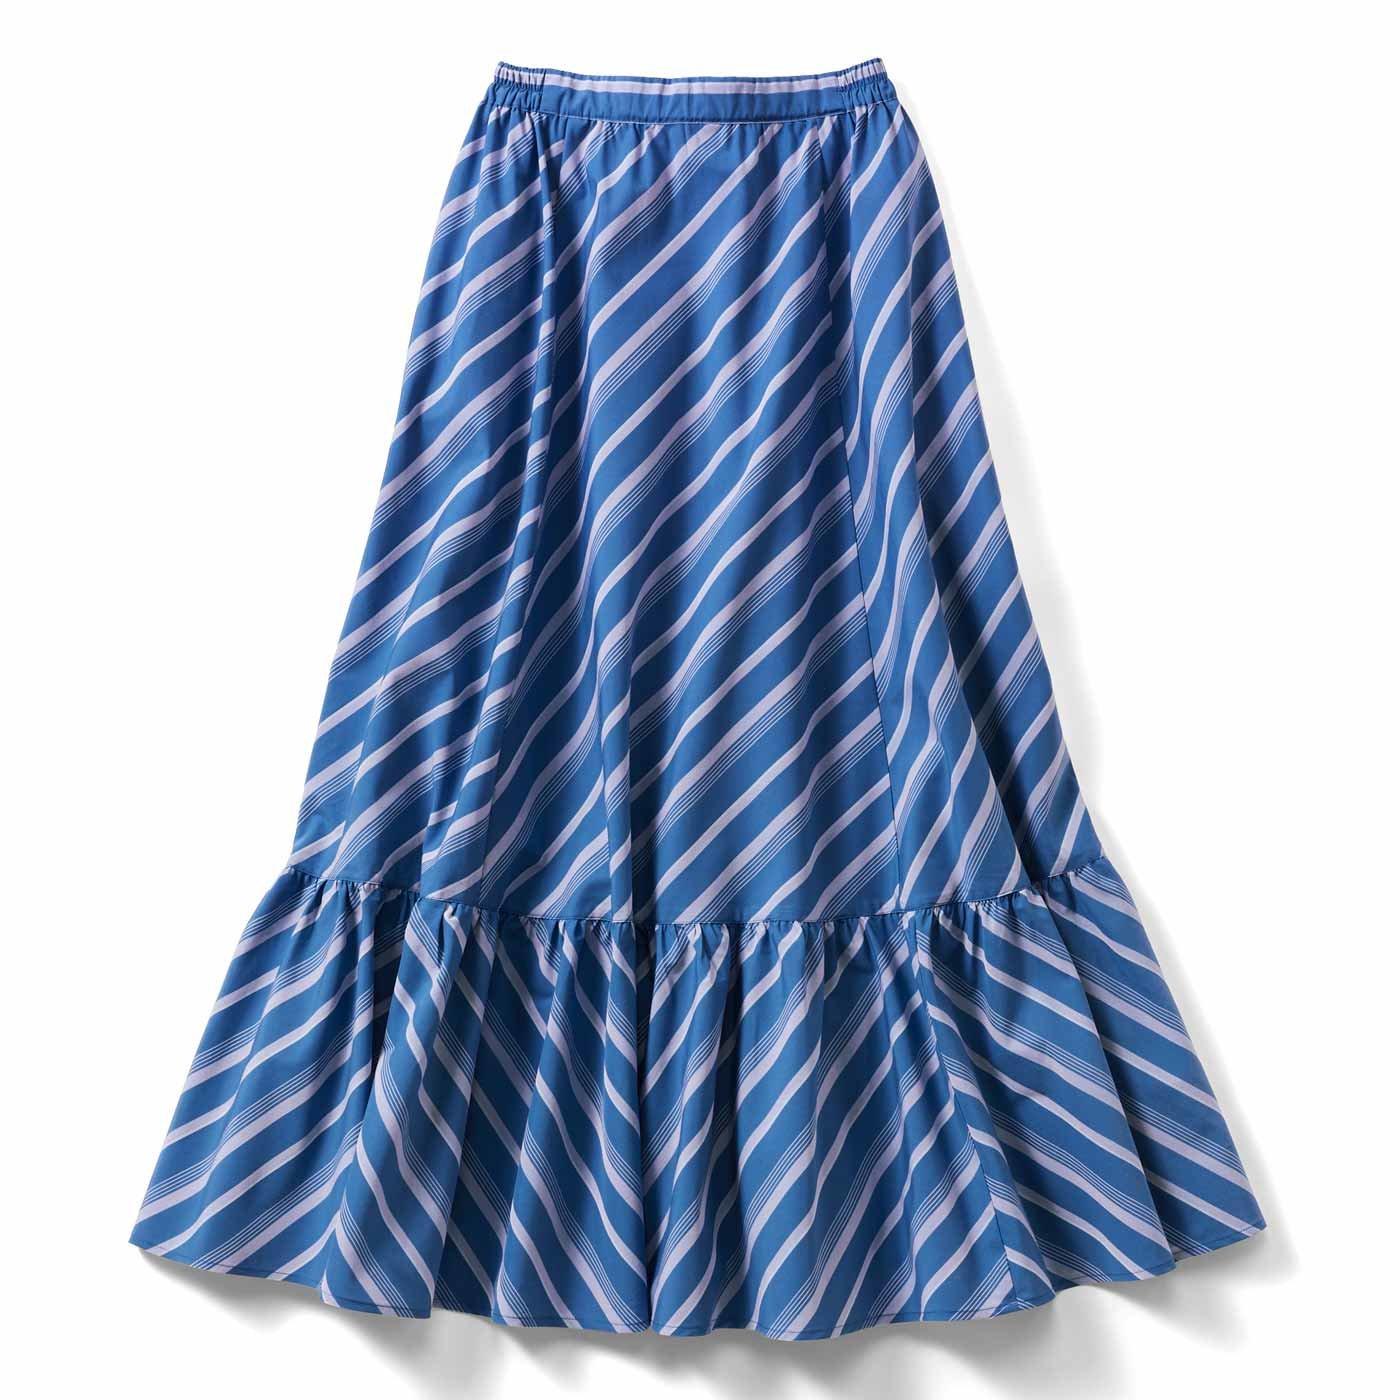 IEDIT[イディット] ストライプ柄切り替えスカート〈ネイビーブルー〉